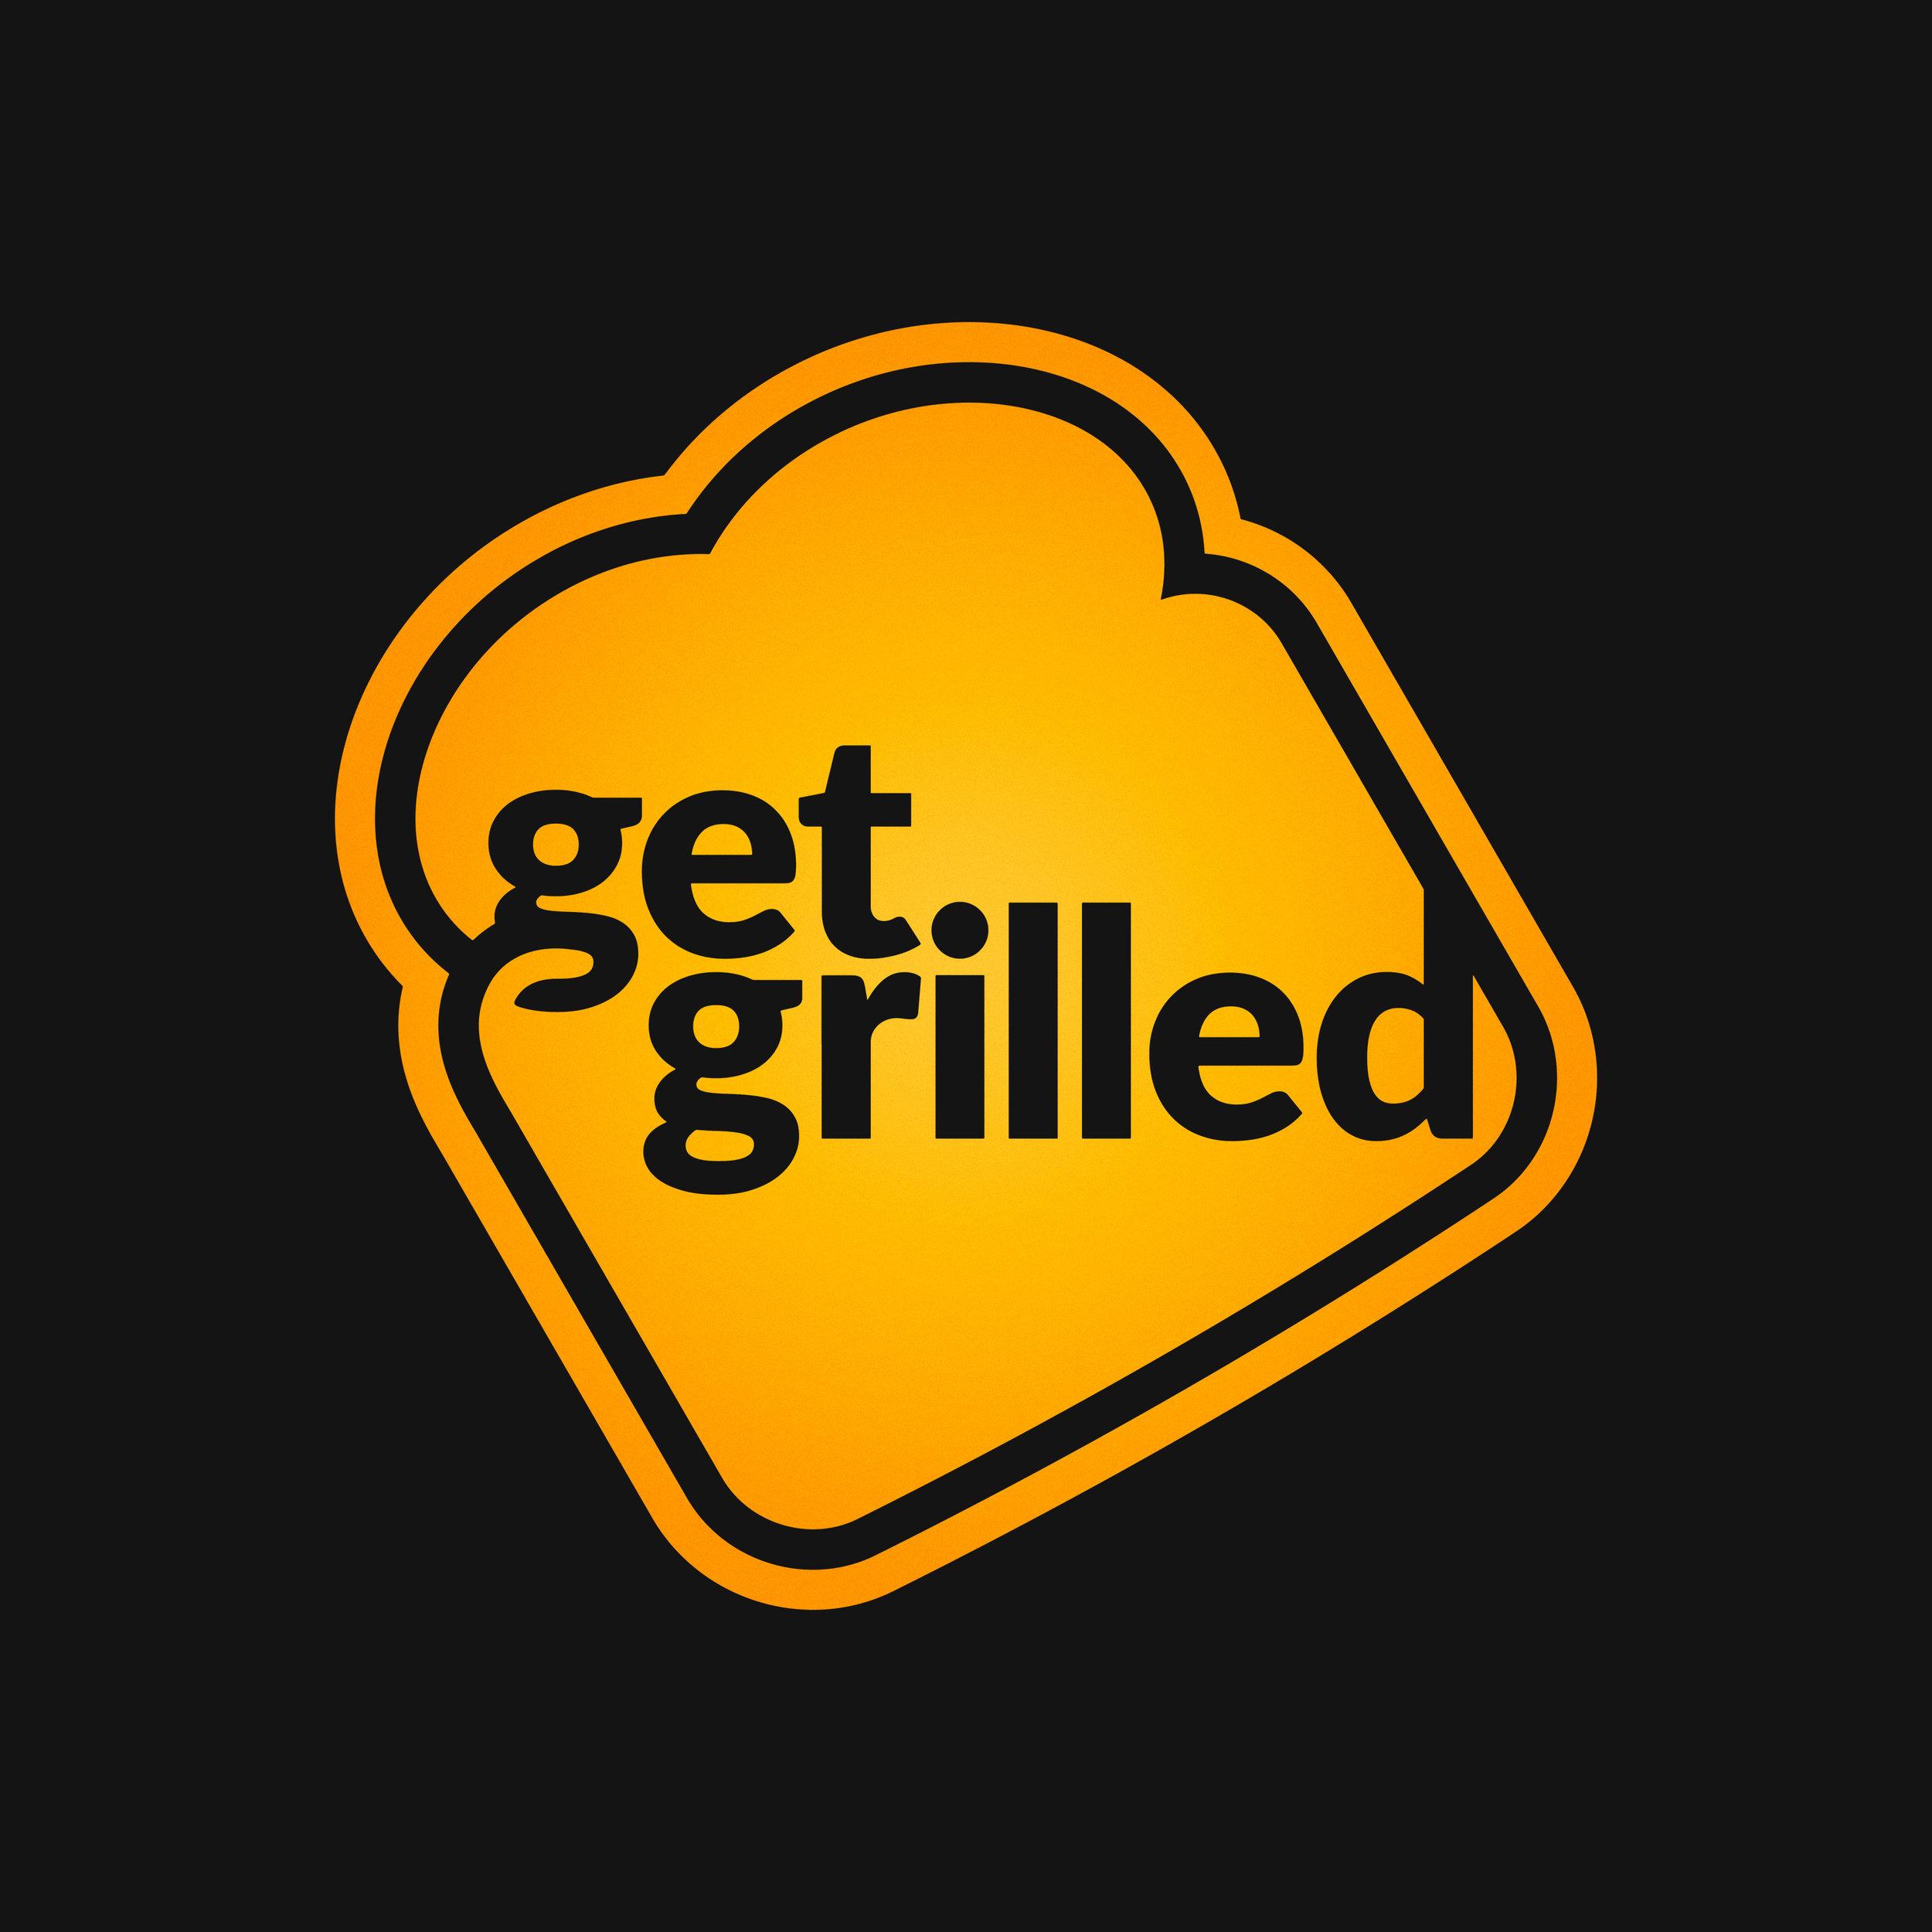 Get Grilled - Combination markSoup & Sandwich KioskWoodbridge Center, New Jersey